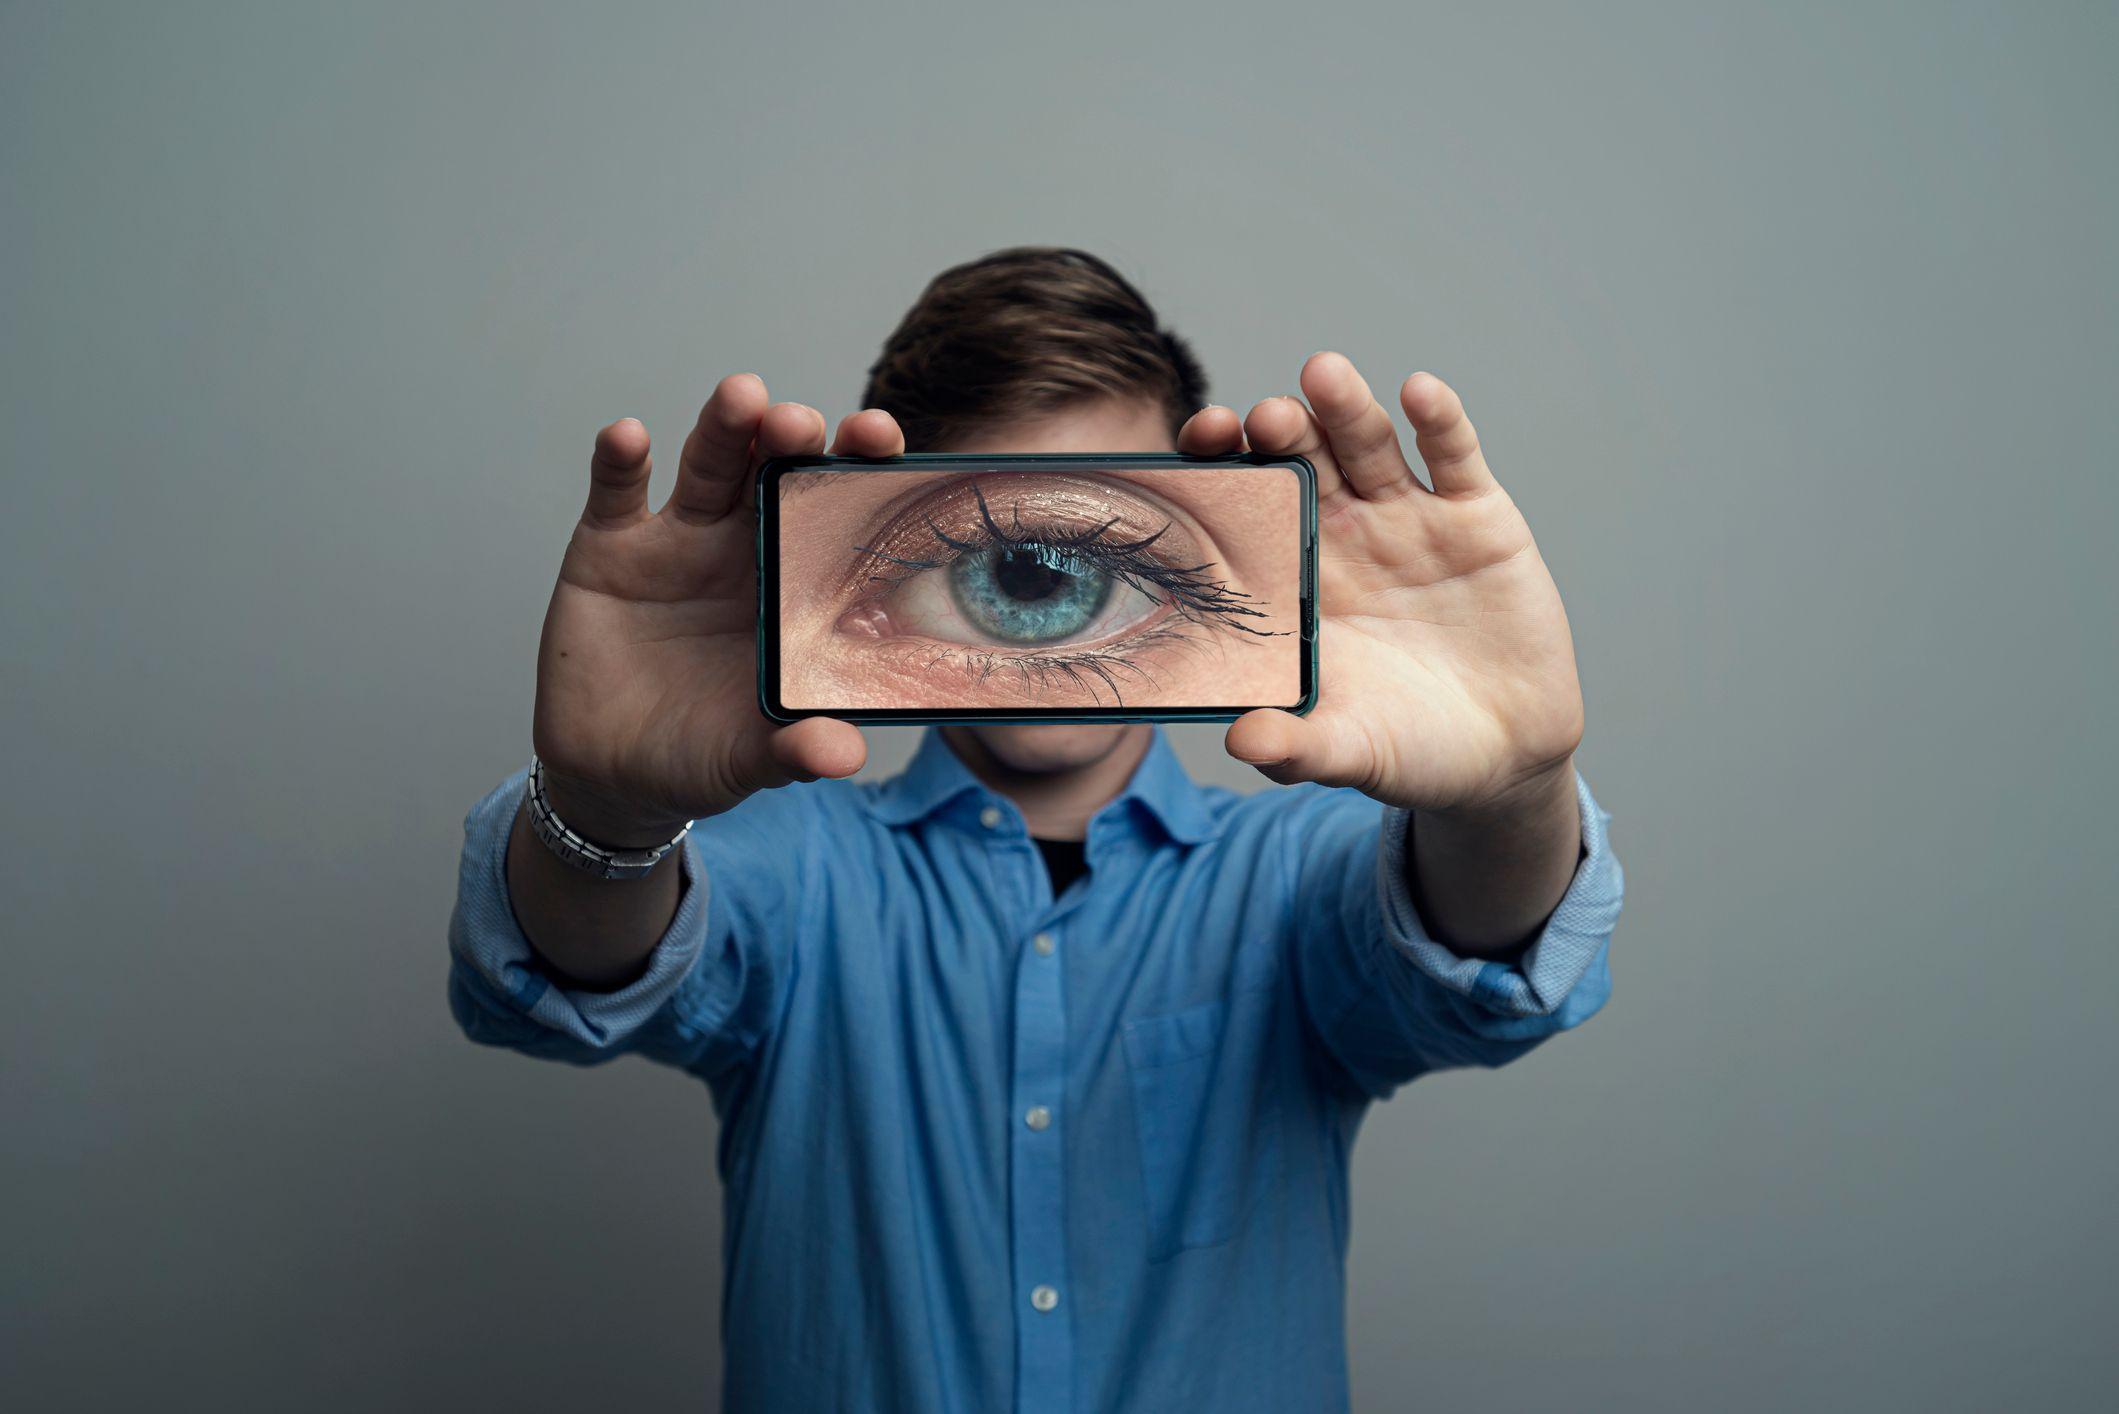 Illustration of Targeted Digital surveillance